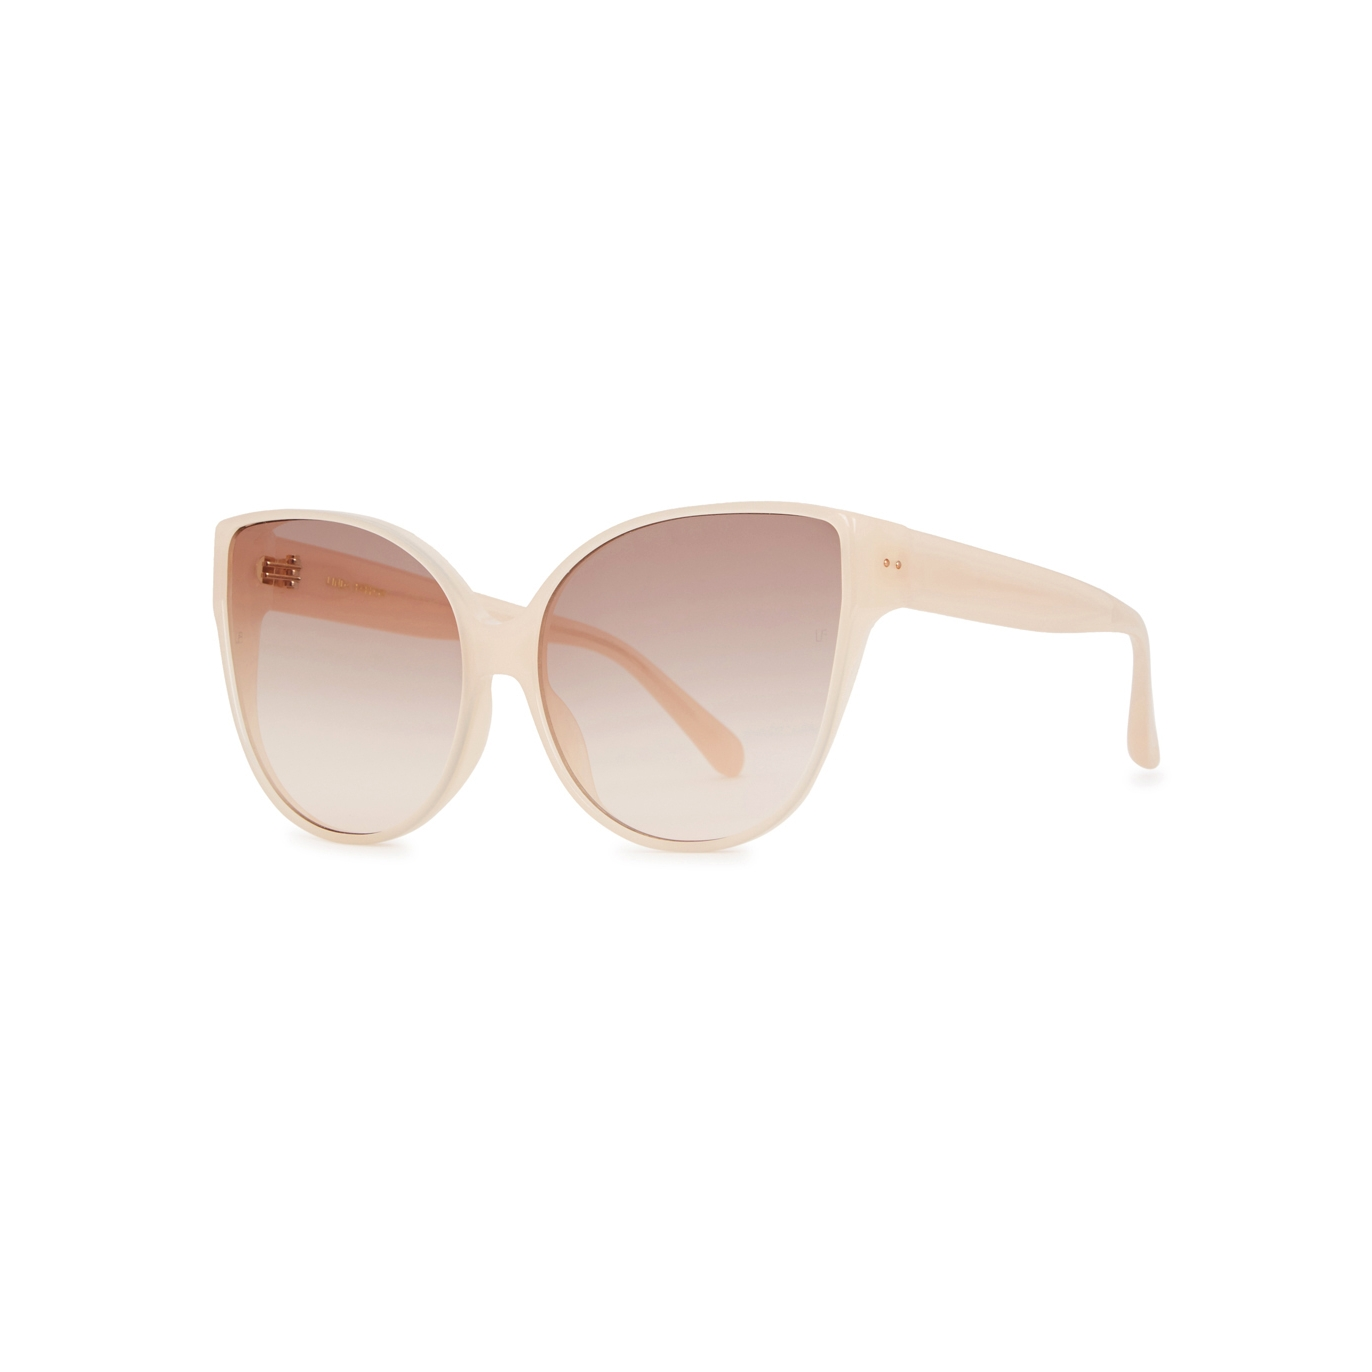 9902b5ade3f Linda Farrow Luxe 656 gold-plated cat-eye sunglasses - Harvey Nichols